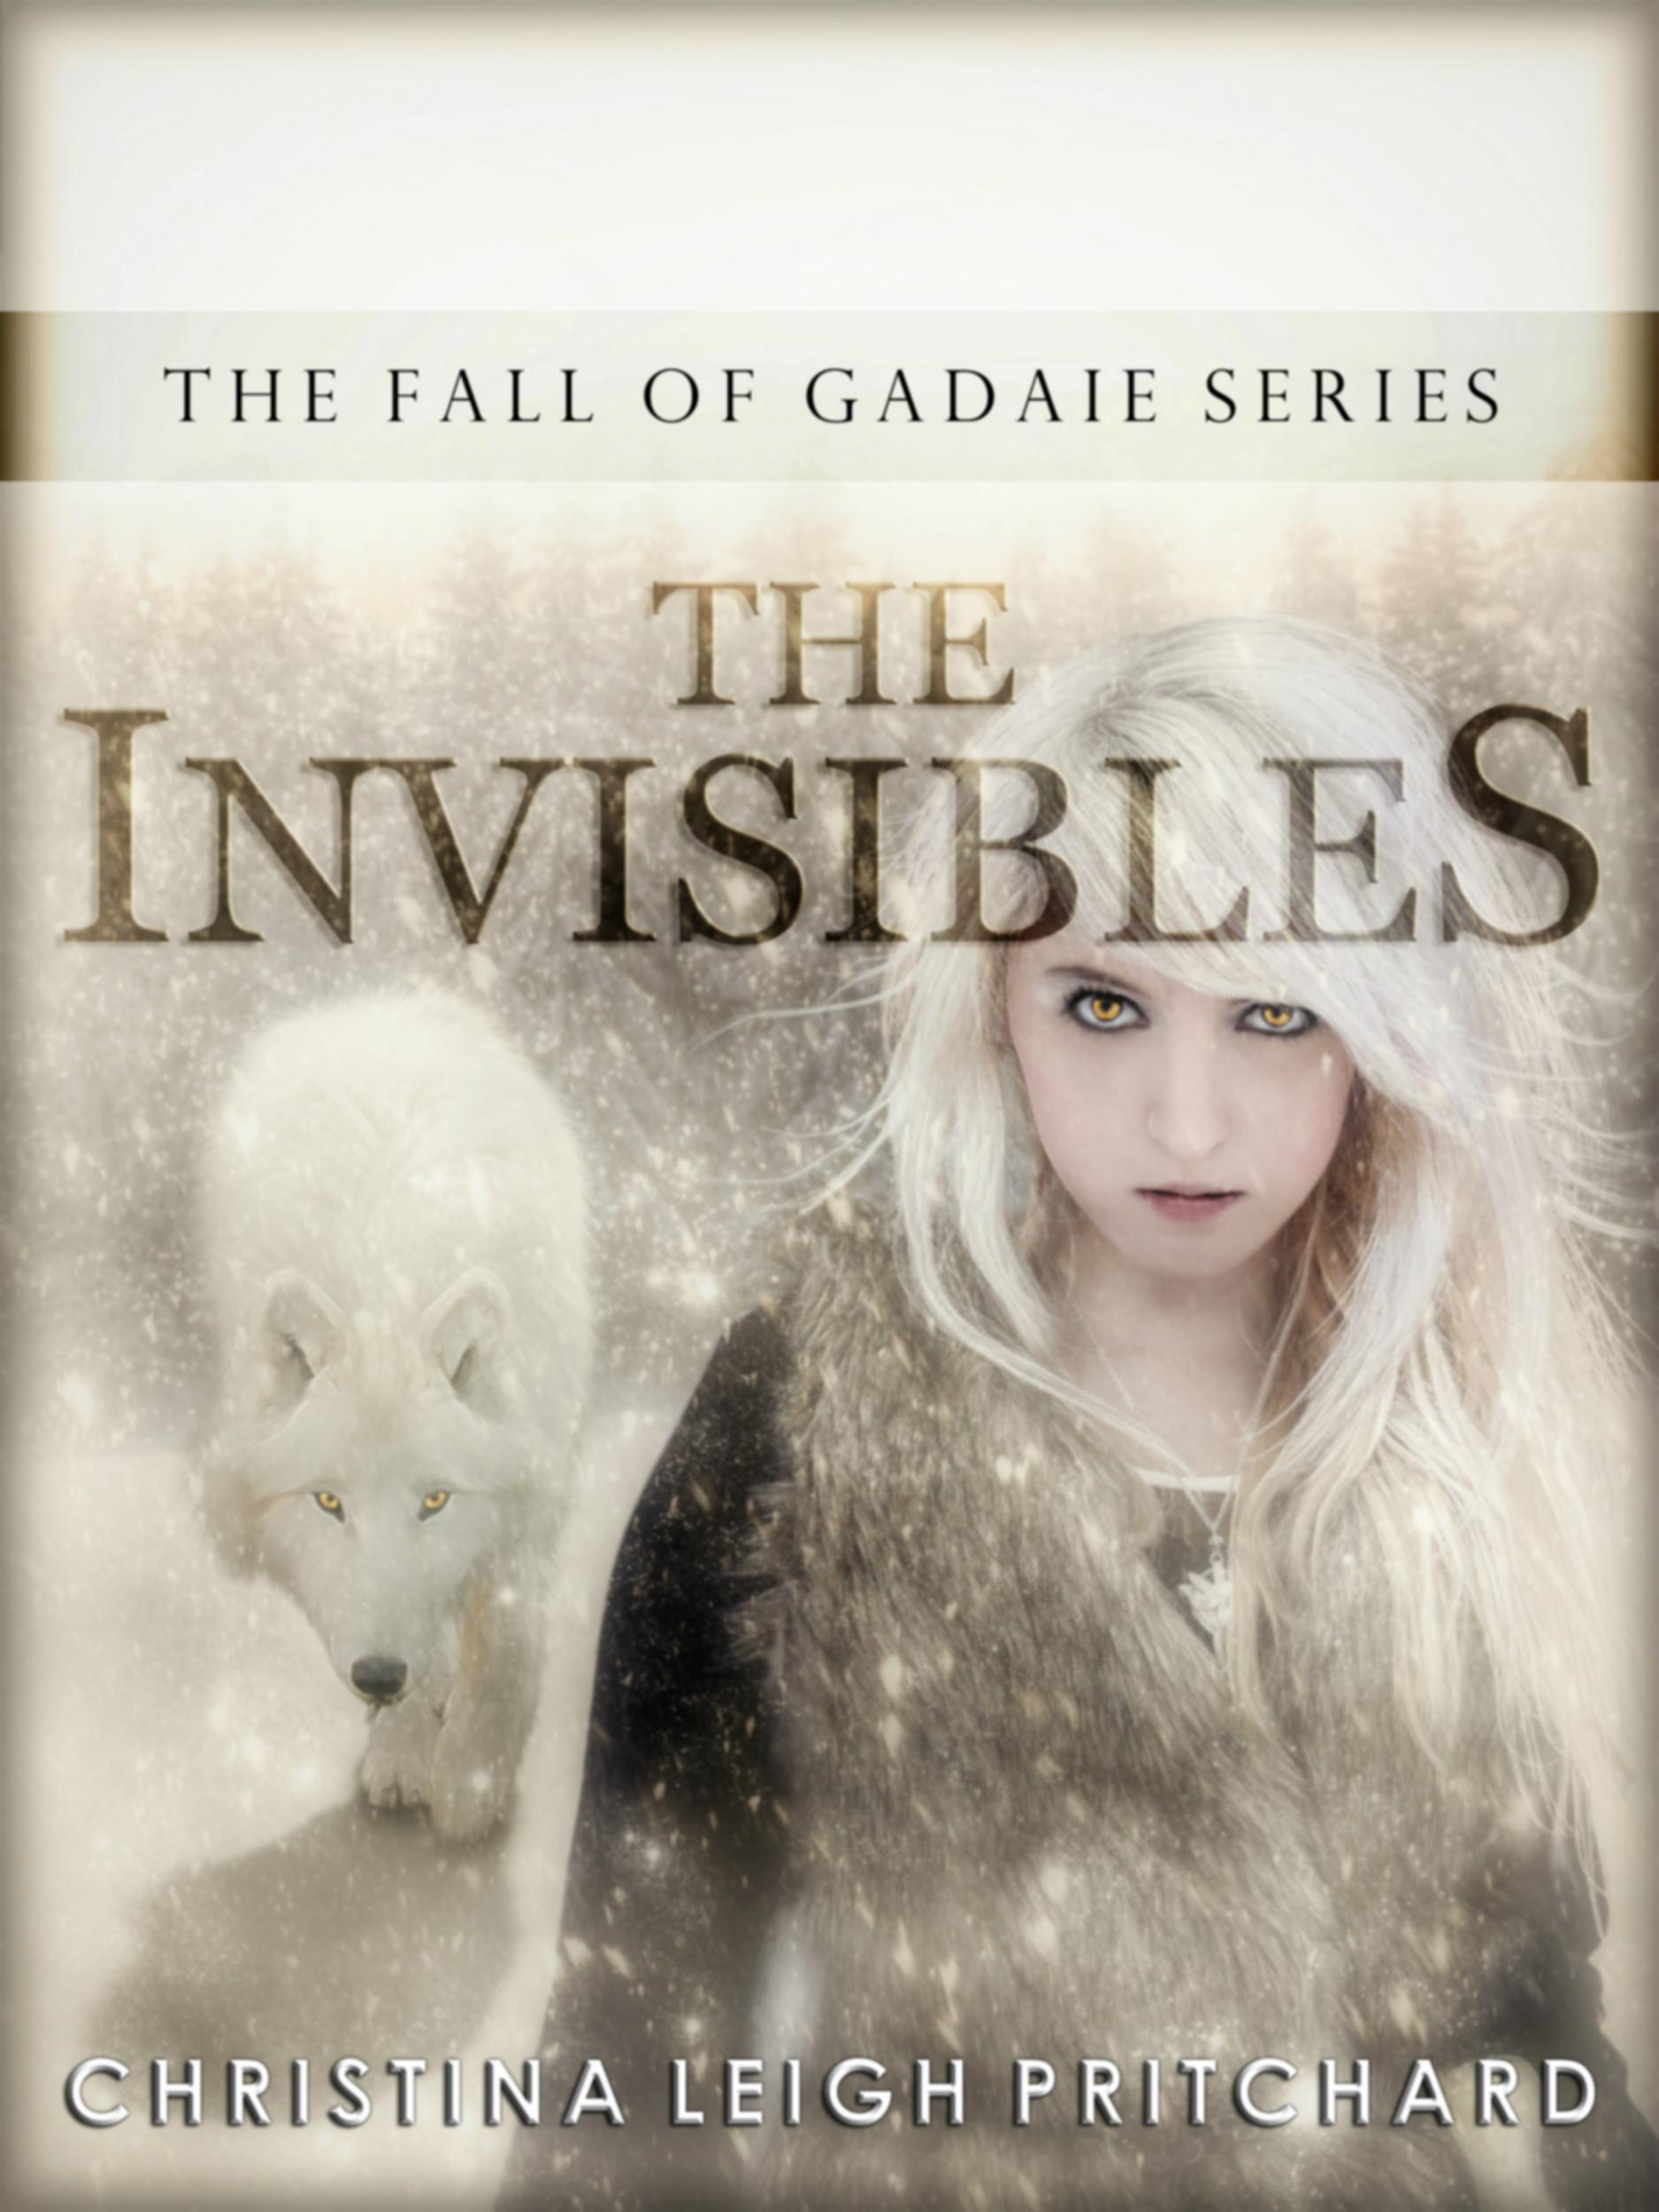 Gadaie Series